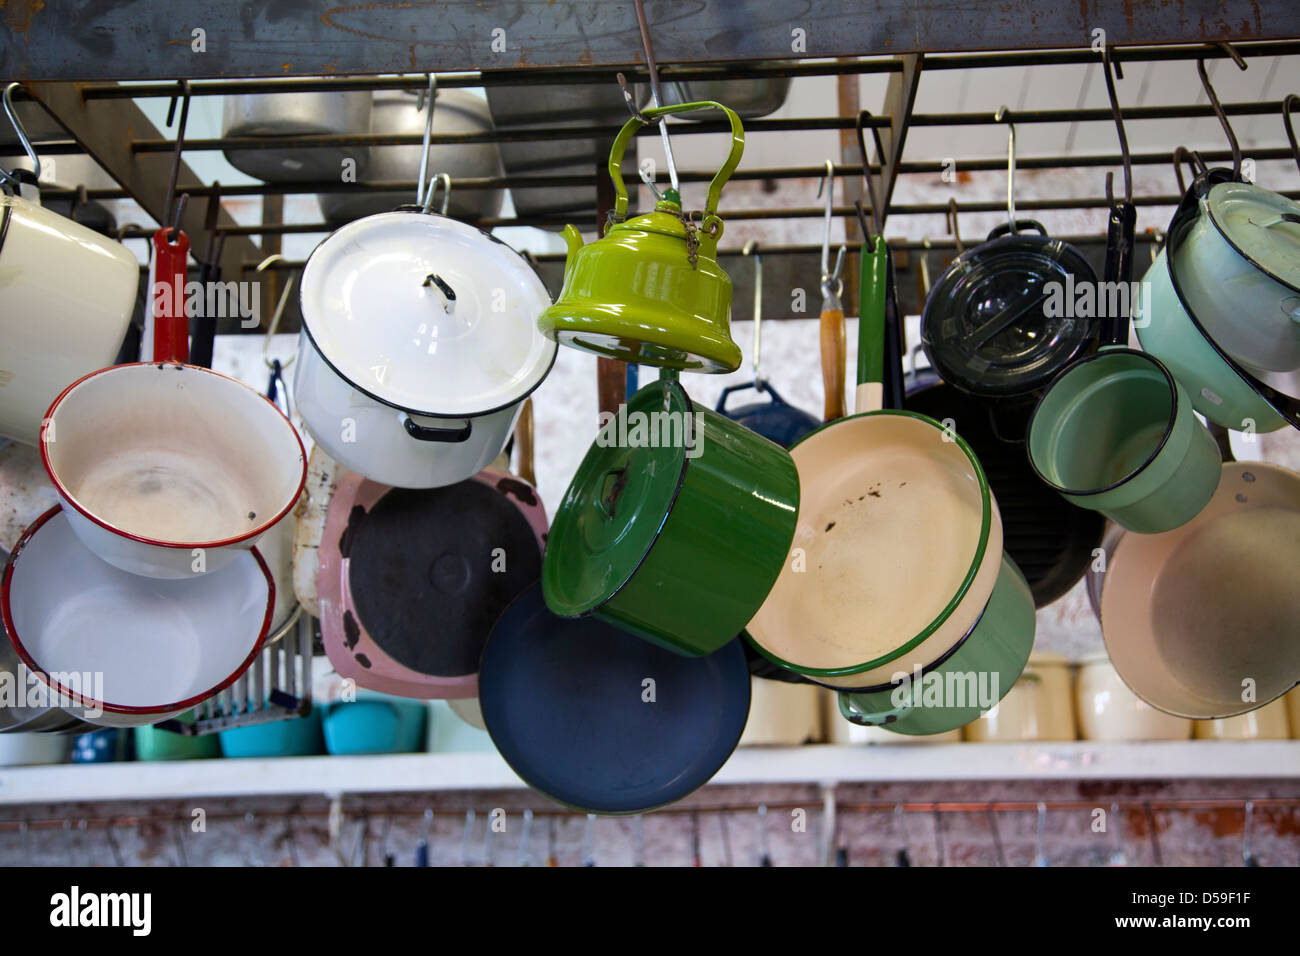 kitchen utensils store ikea appliances stock photos and